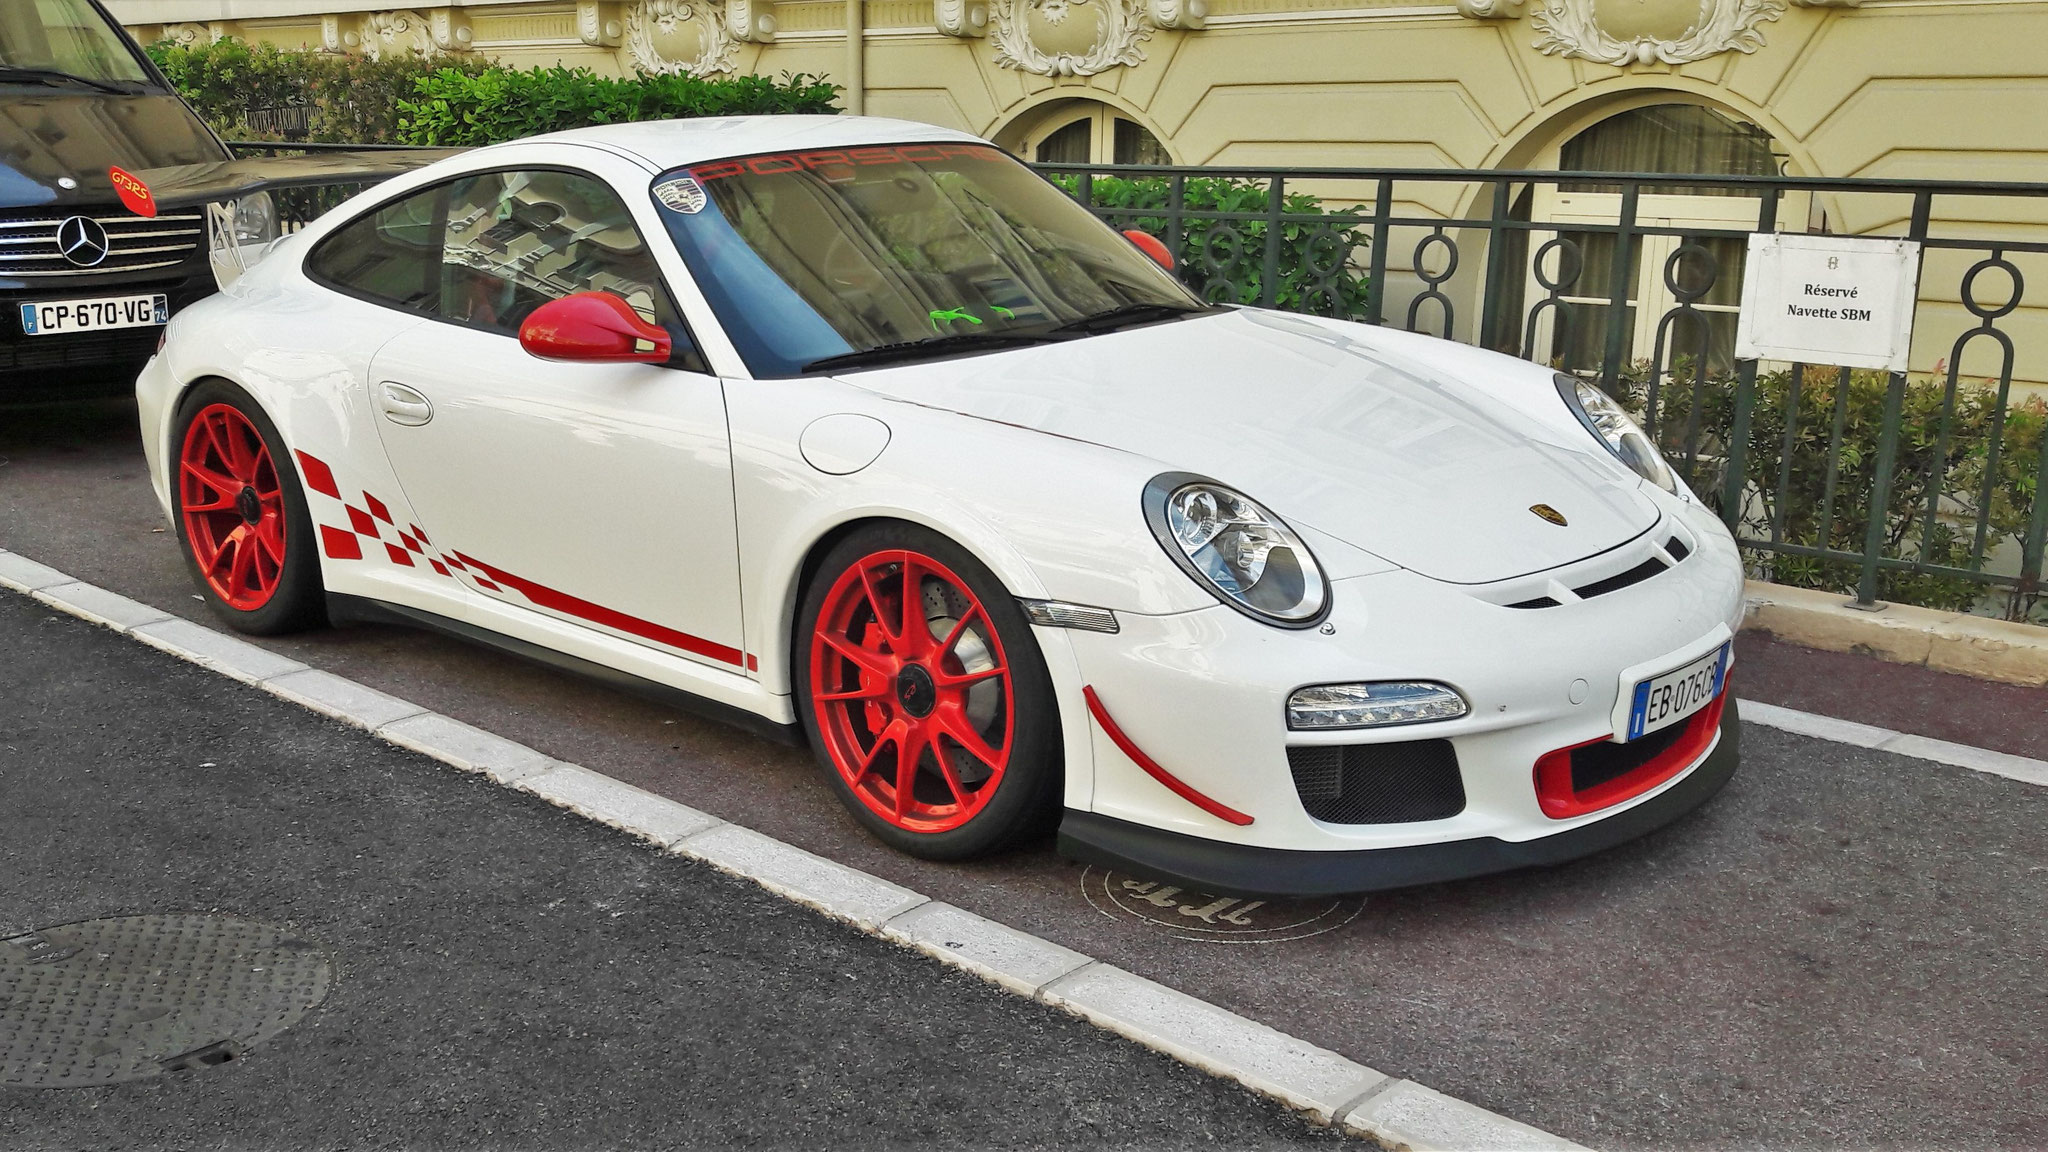 Porsche 911 GT3 RS - EB-076-CB (ITA)